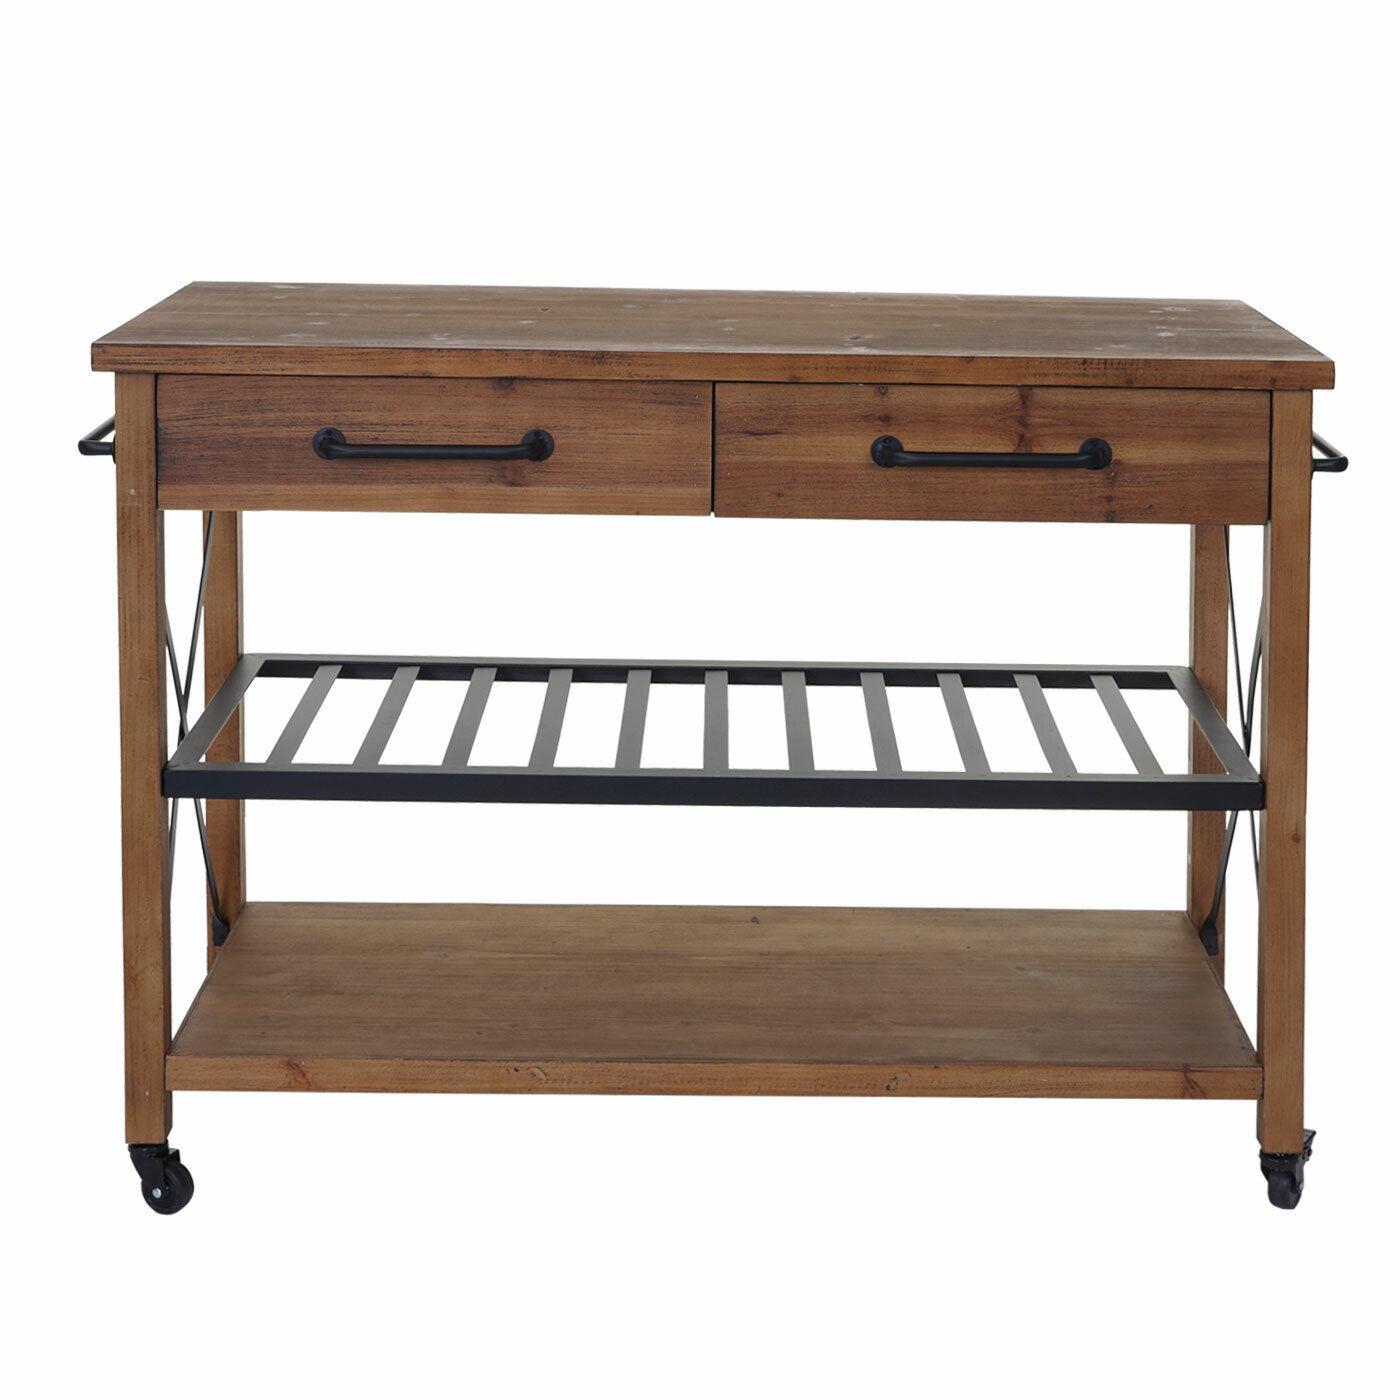 Trolley mcw-c86, Kitchen Trolley Bar Kitchen Helper, 85x114x47cm, Natural